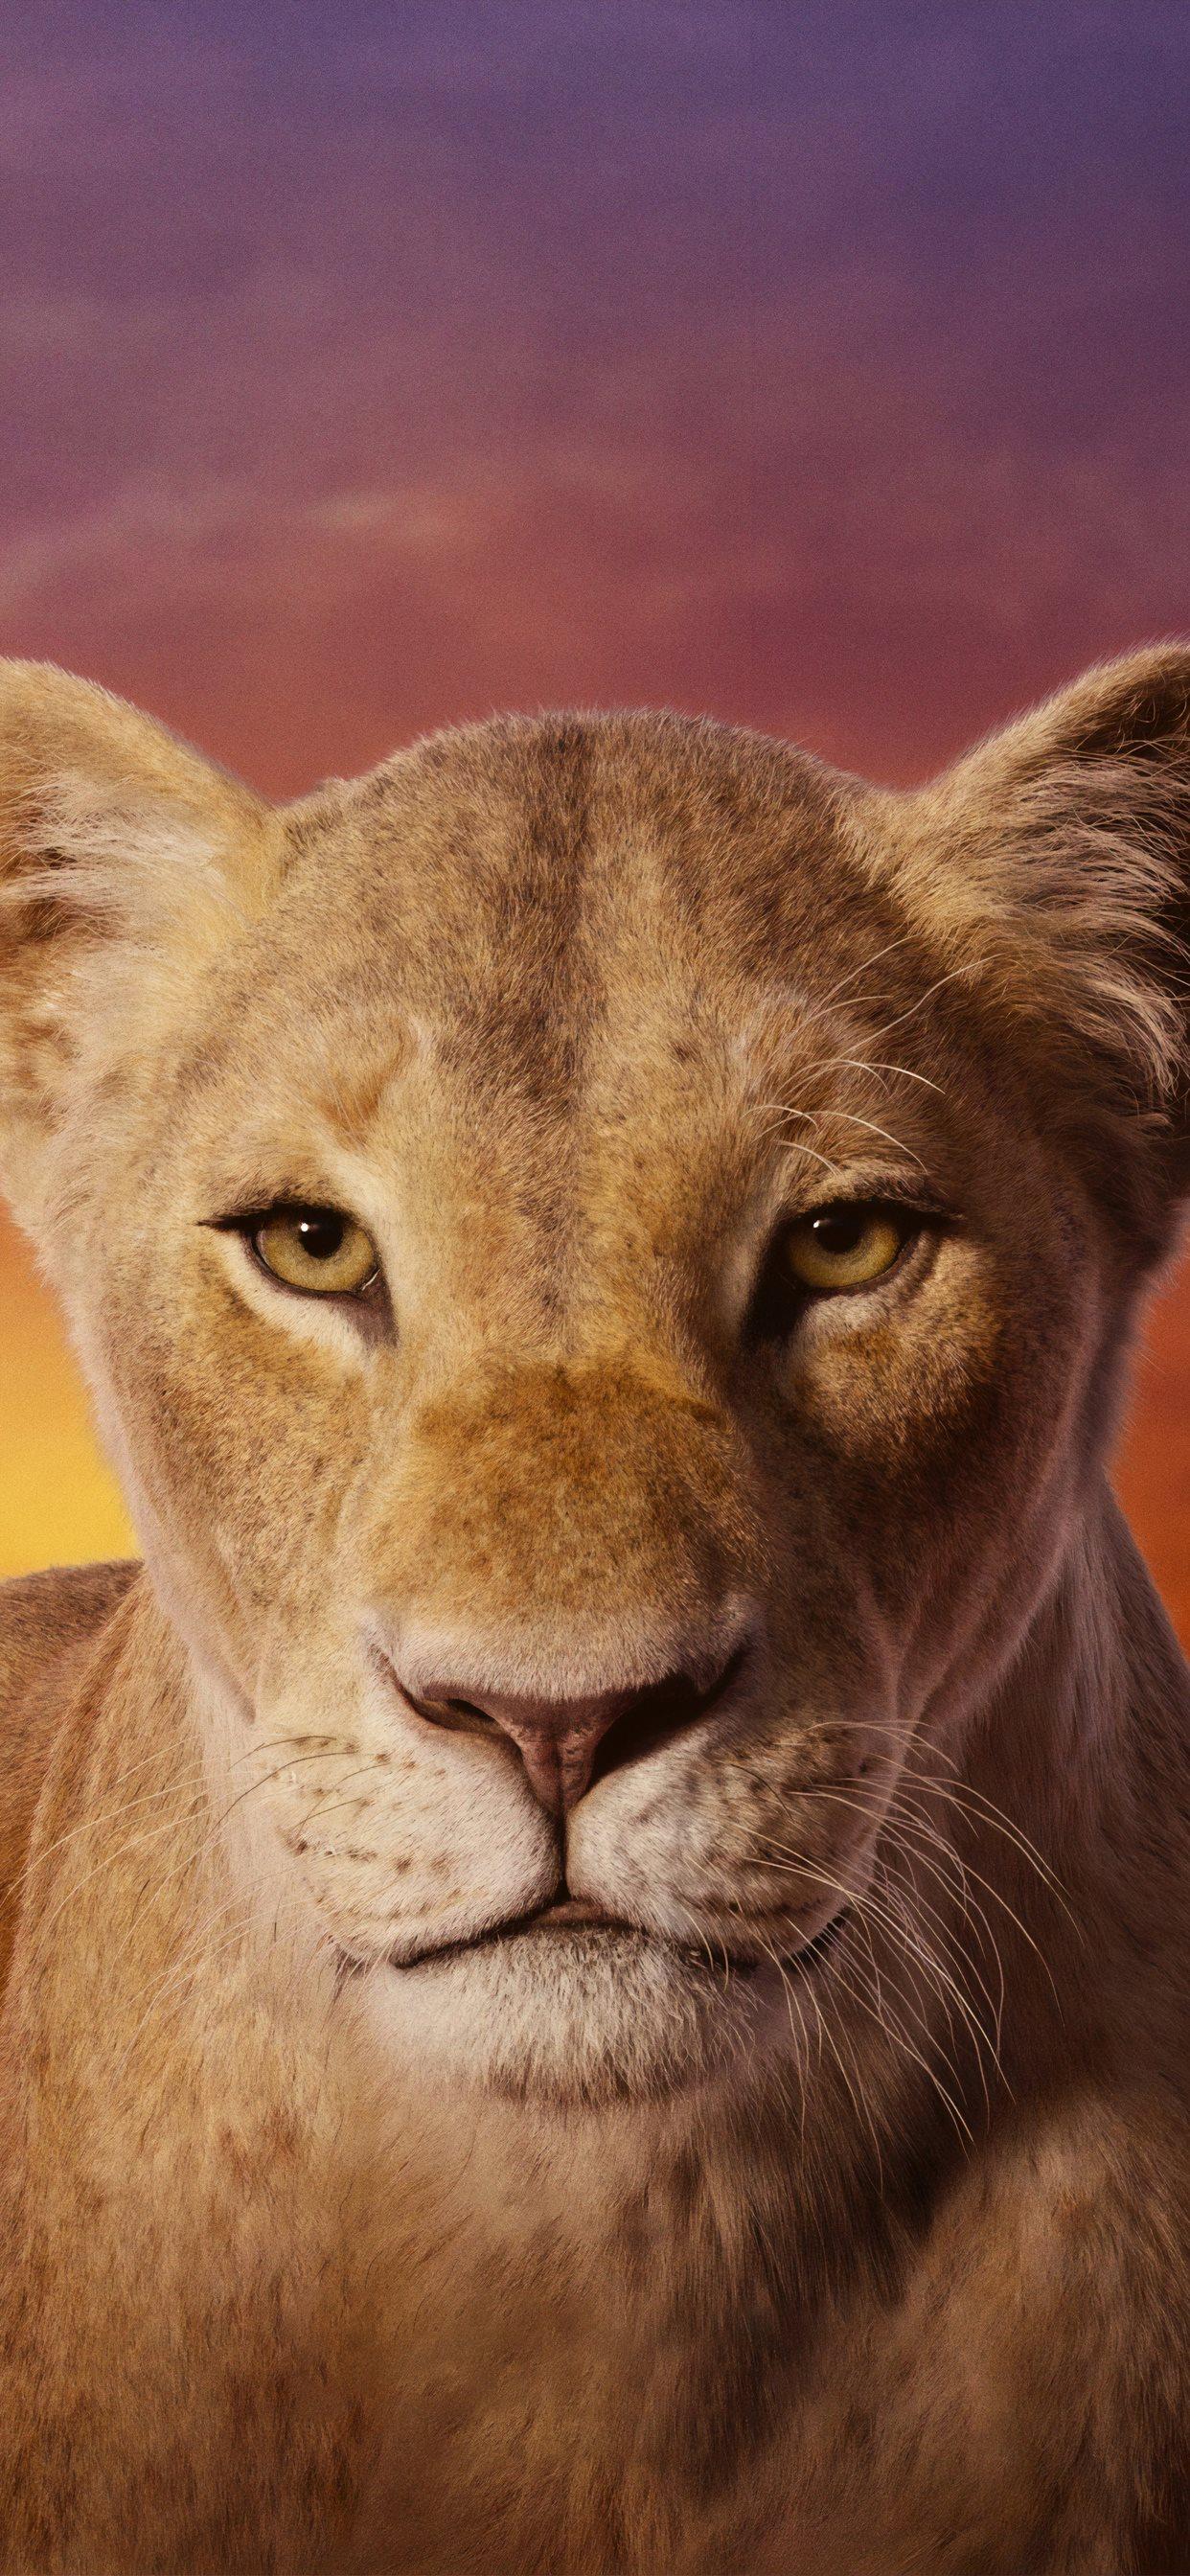 Beyonce As Nala The Lion King 2019 4k Iphone X Wallpapers Free Download